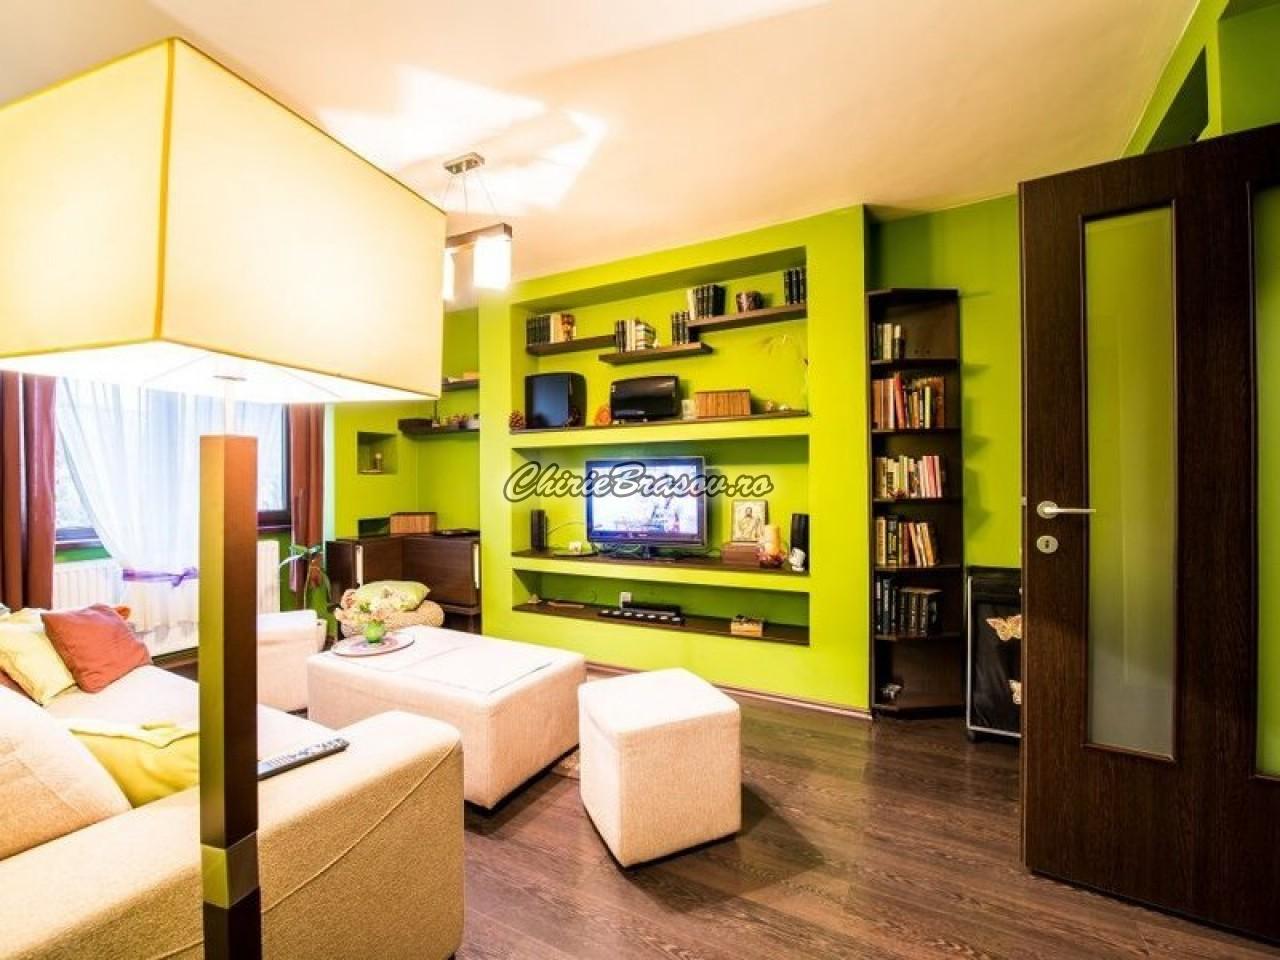 Inchiriere apartament 2 camere Brasov , Central - Grivitei-353-3